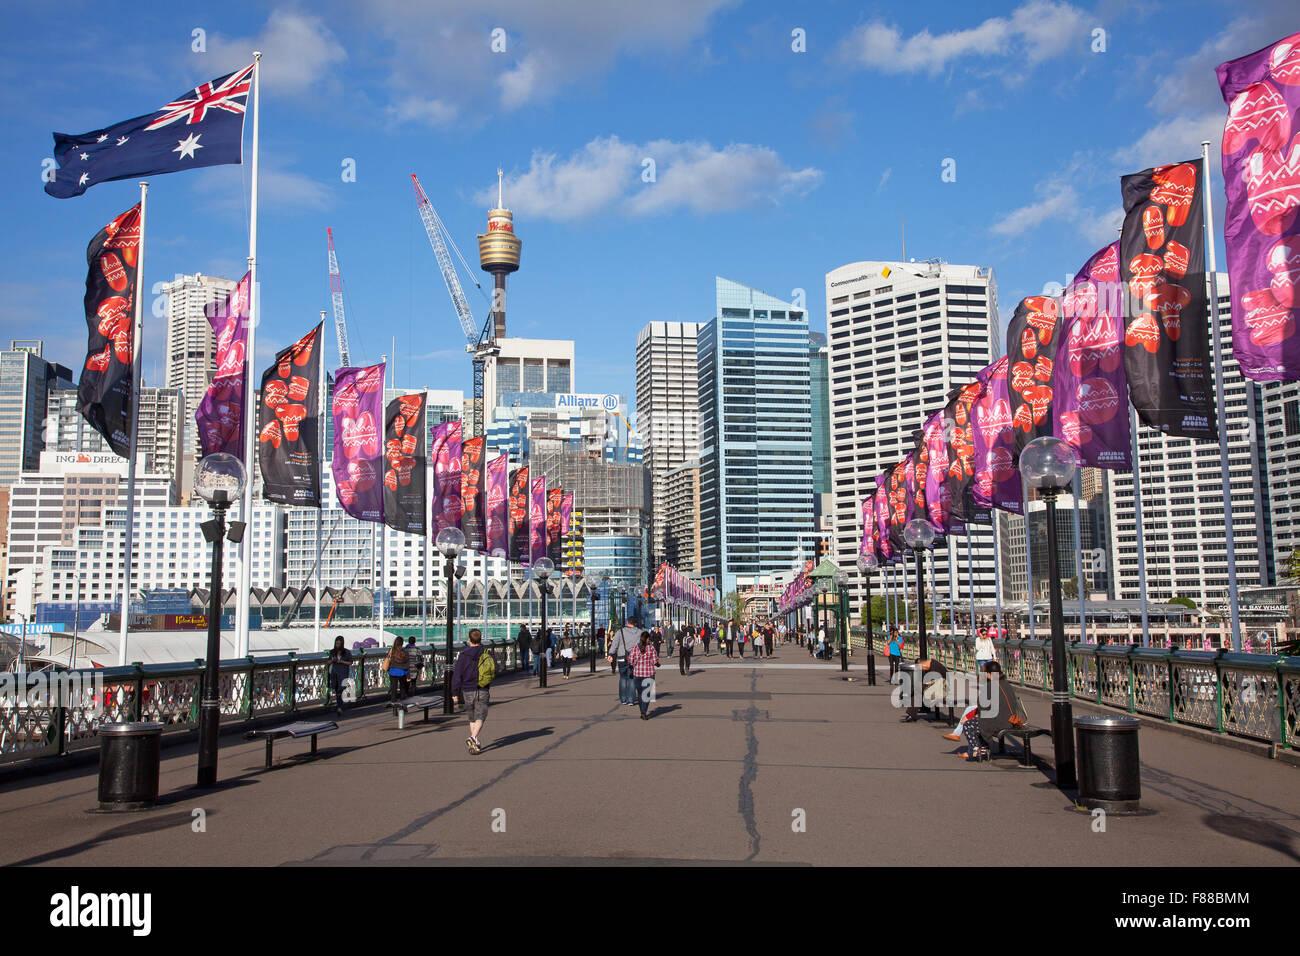 Pyrmont Bridge, Darling Harbour, Sydney, NSW, Australia - Stock Image